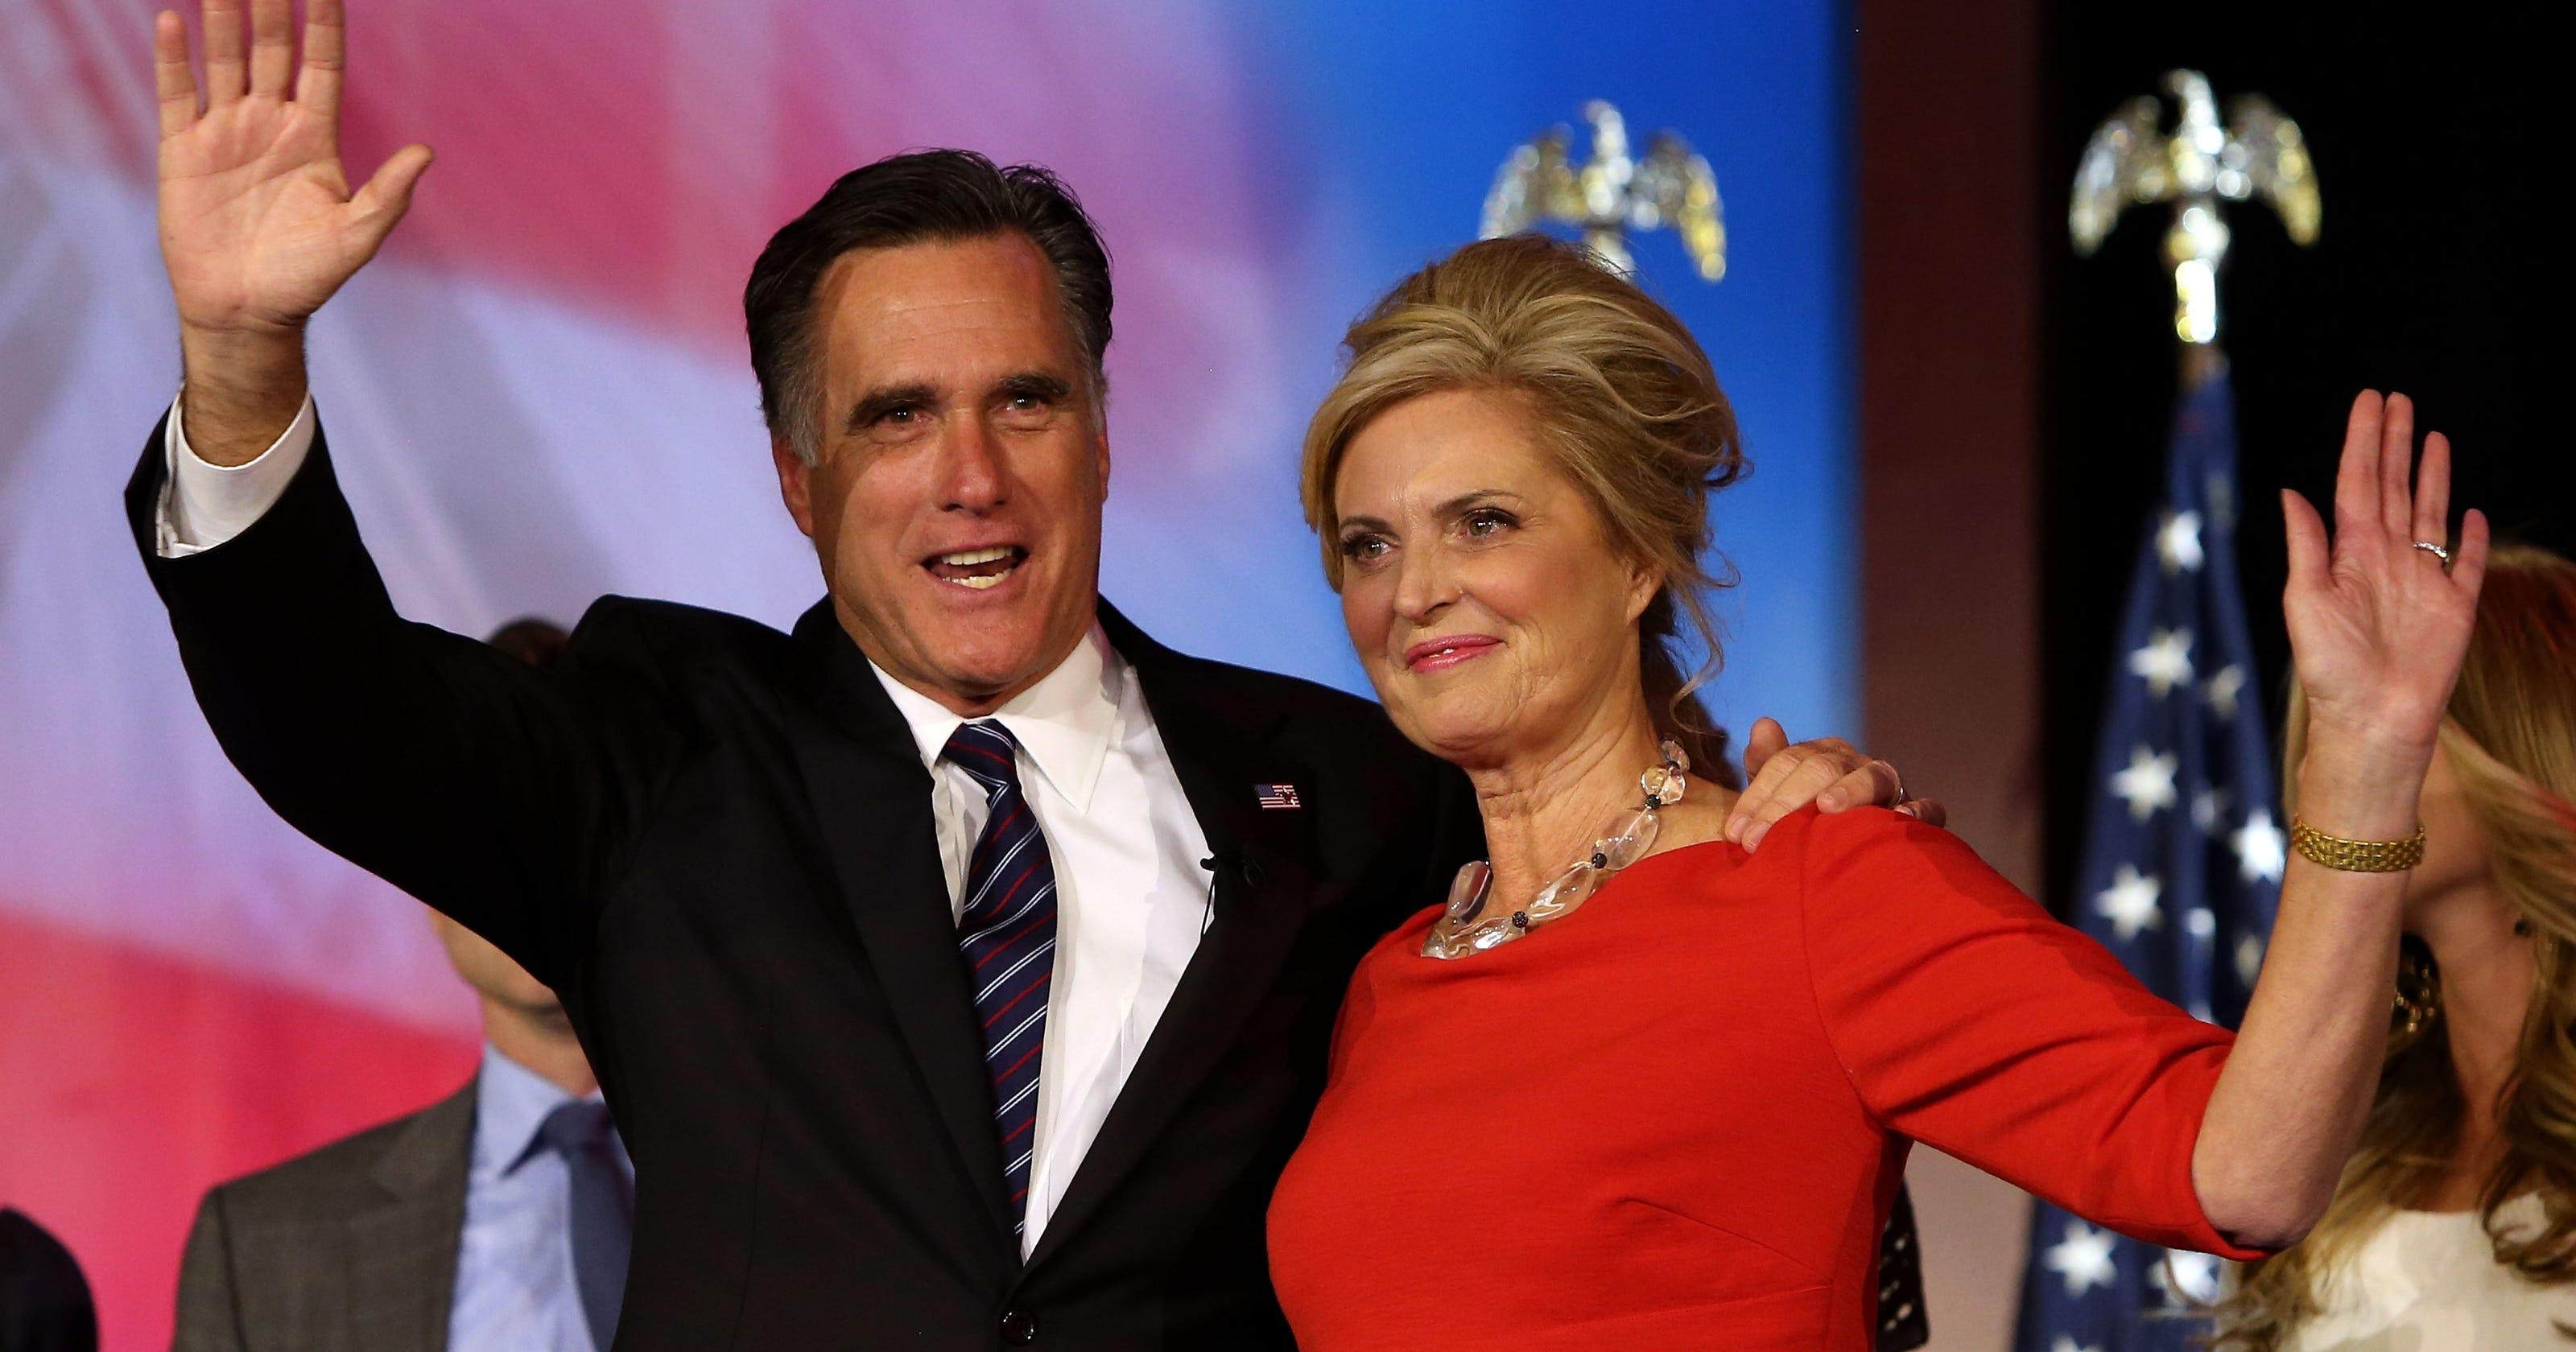 Mitt Romney Loads Up At Costco